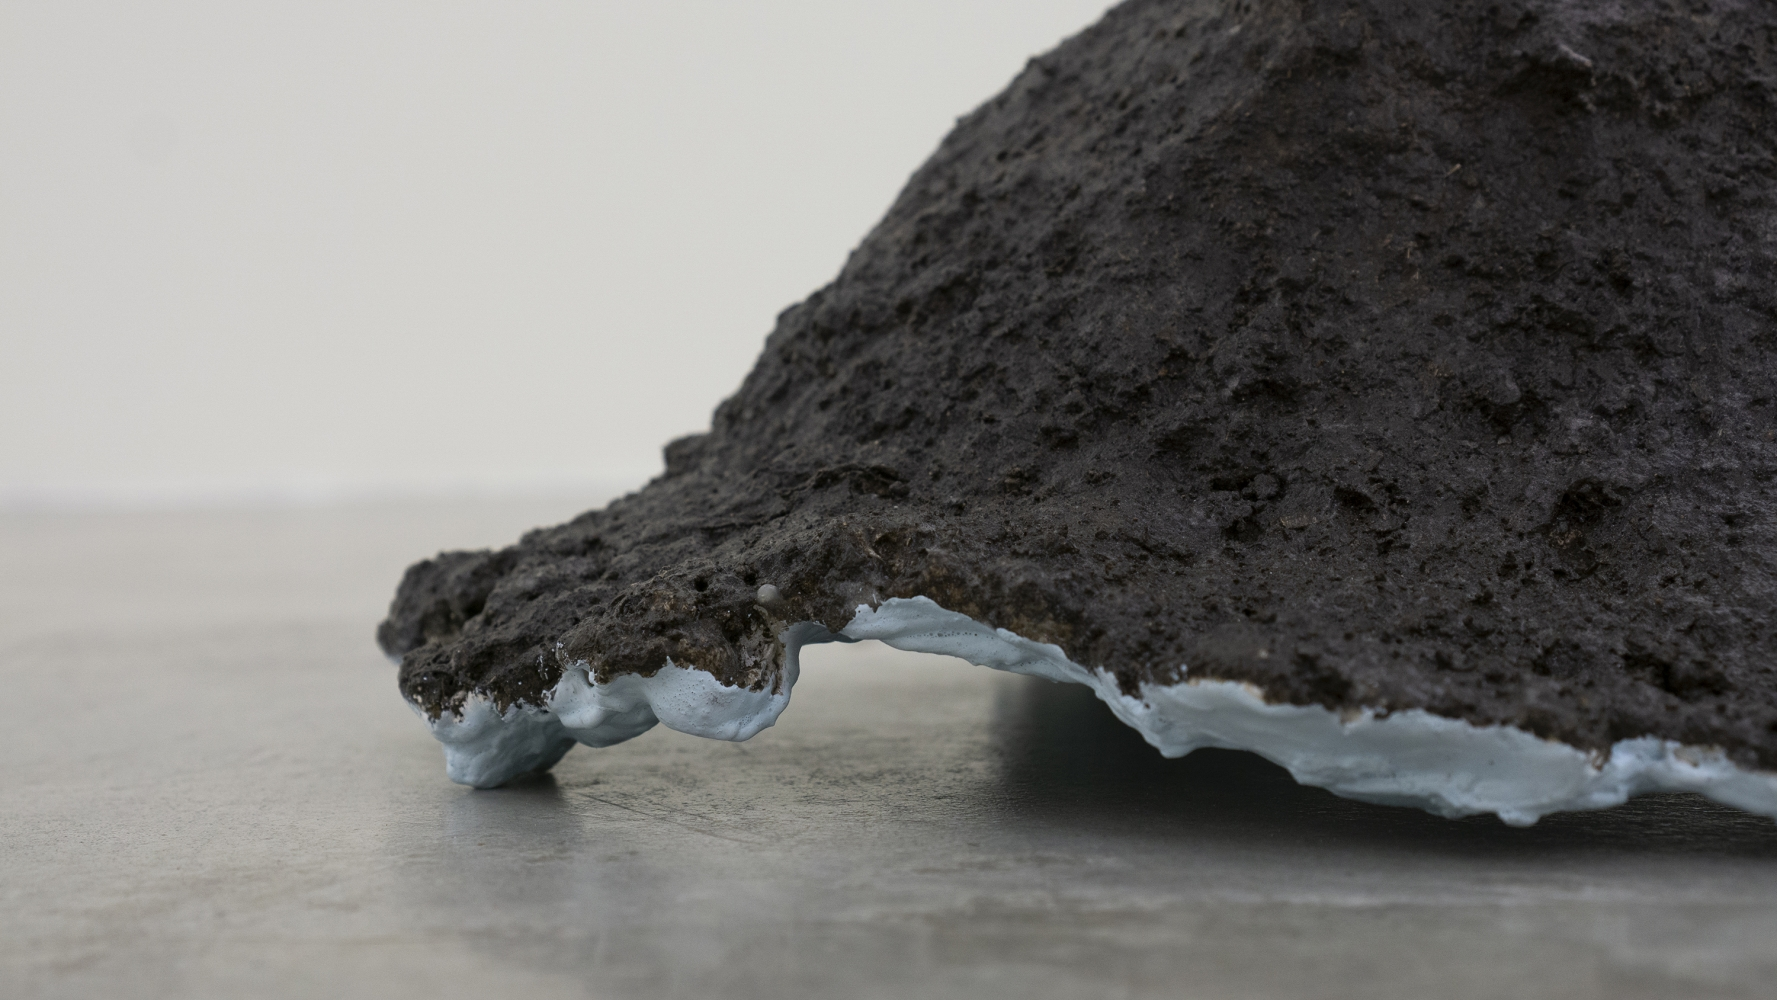 Tania Pérez Córdova (b. 1979) Short Sight Box - Hole C, 2020 Imprint of a hole dug in a field, earth, plant roots, plaster, mesh, enamel paint 17 x 14.5 x 7.5 inches 43.2 x 36.8 x 19.1 cm